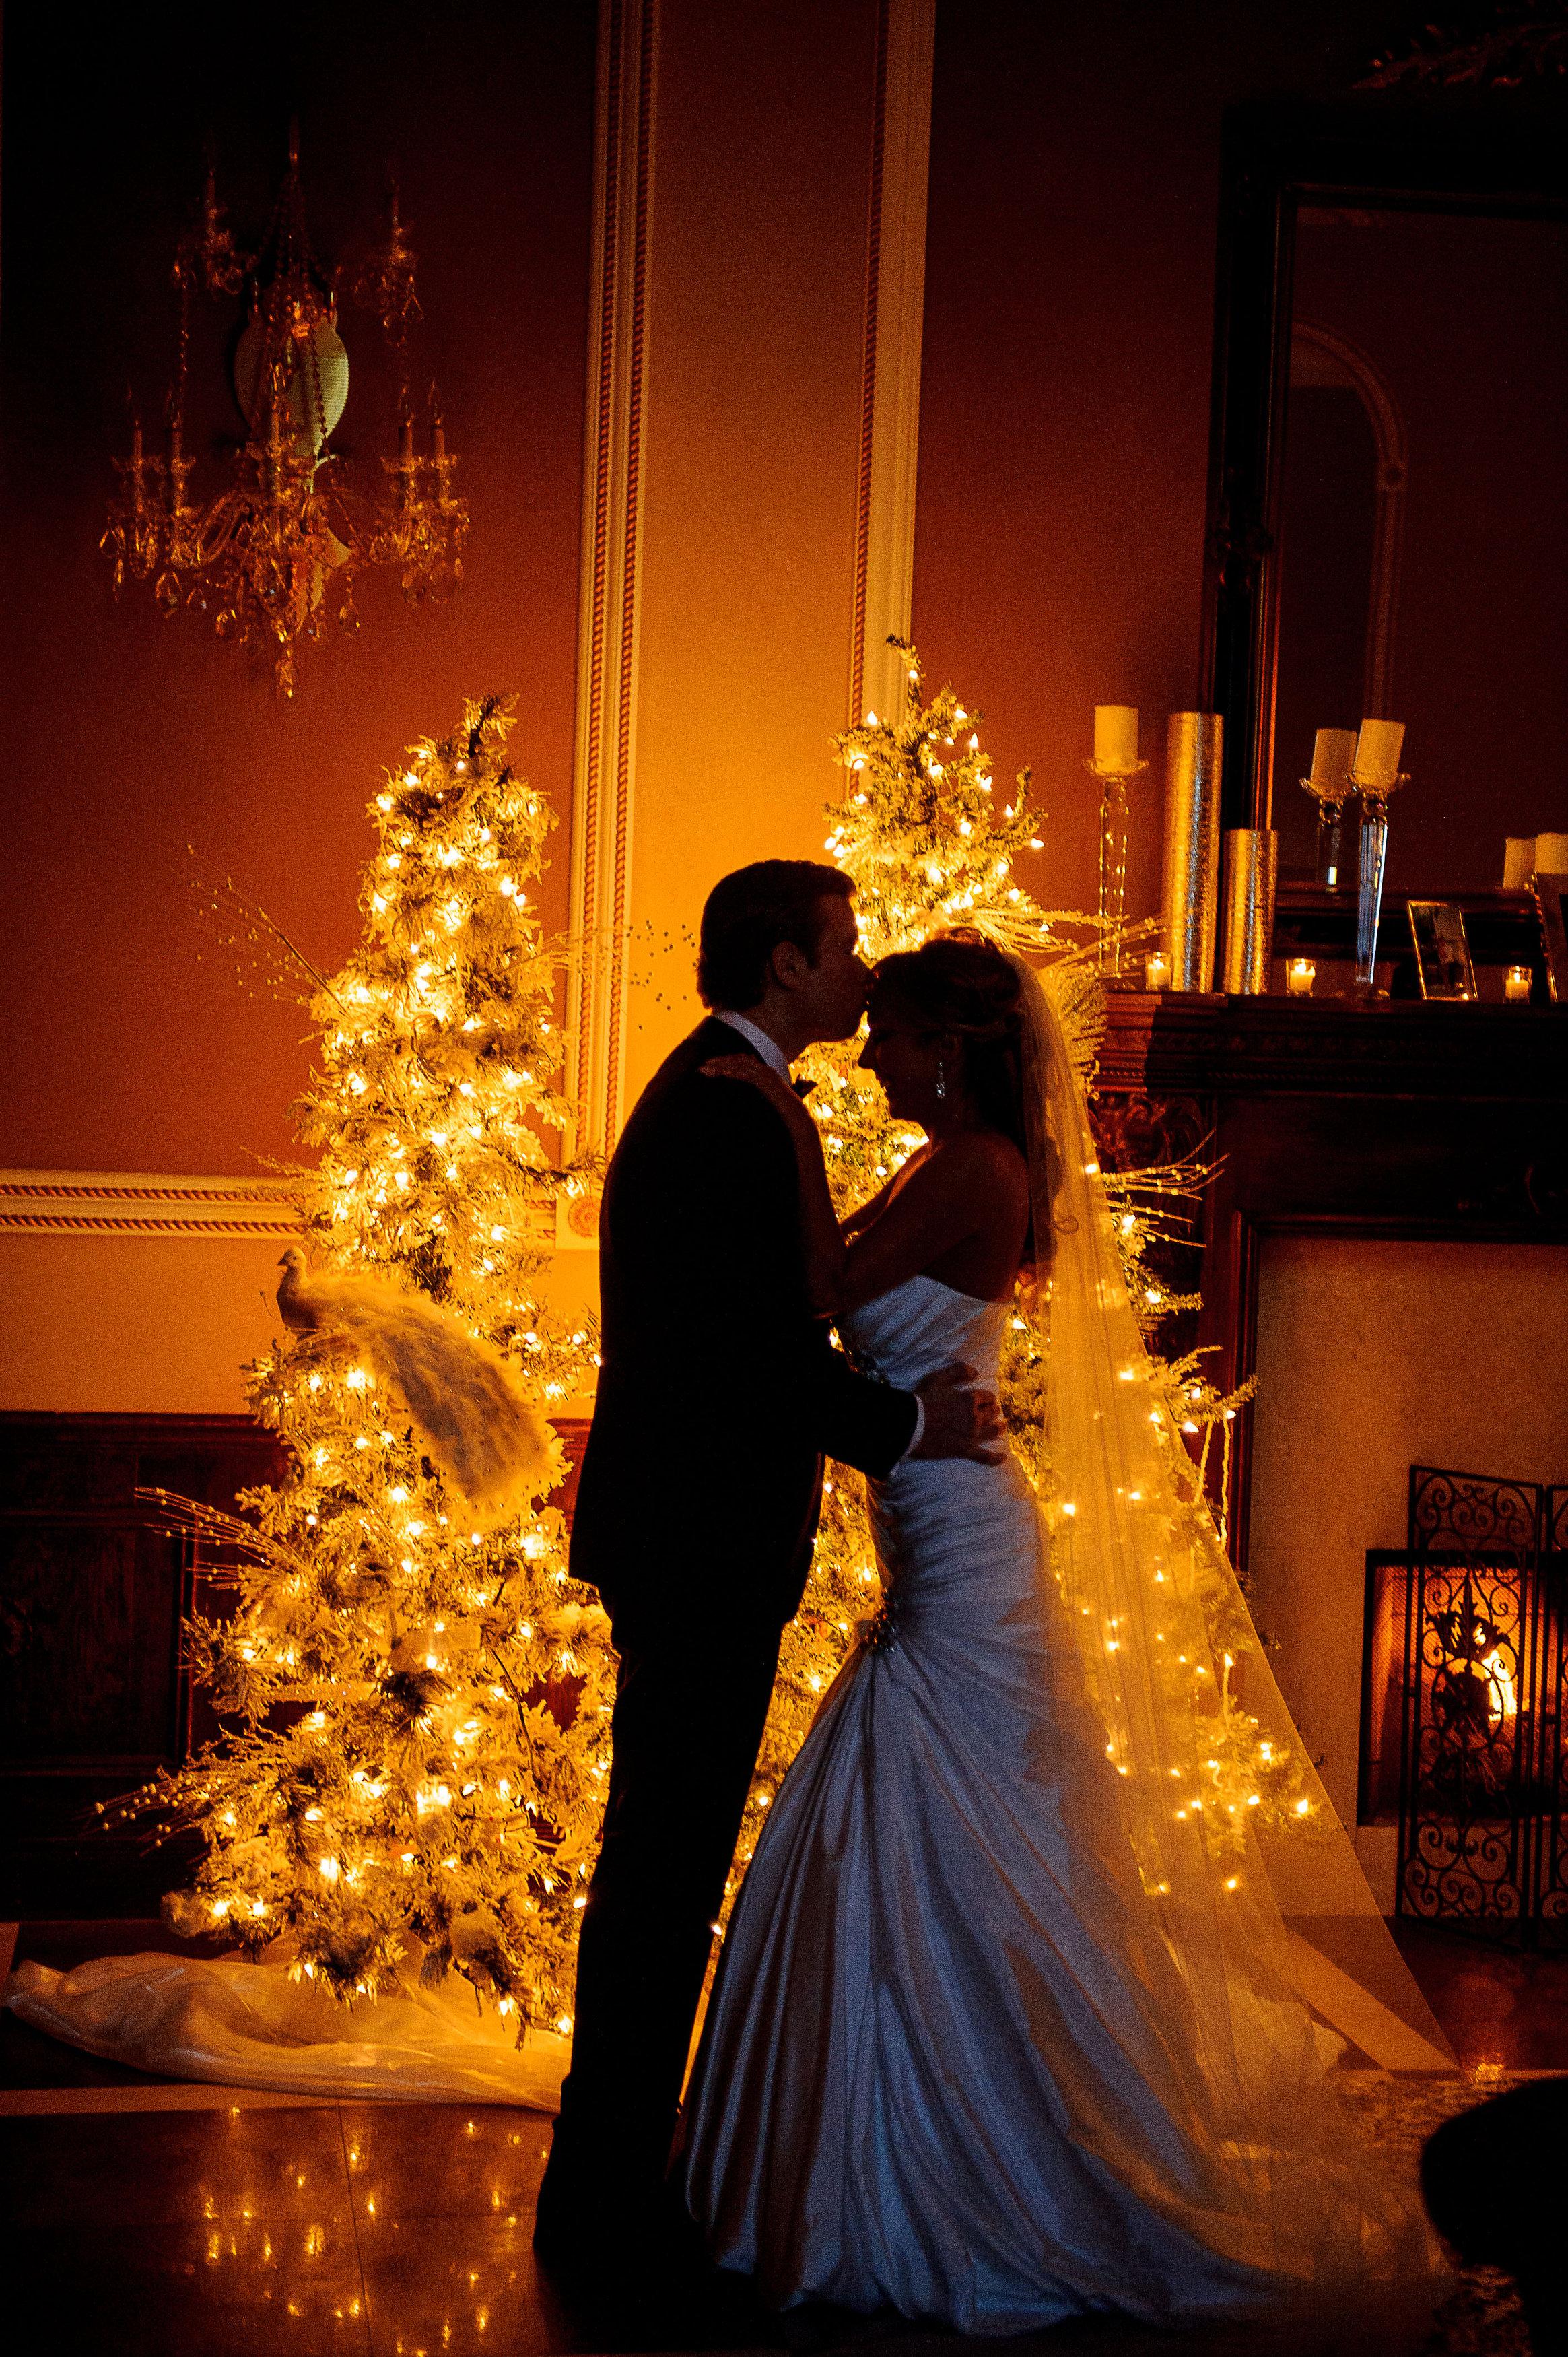 Ceci_New_York_Custom_Invitation_ New_Jersey_Wedding_Luxury_Personalized_Ceci_Style_Bride_Foil_Stamping106.JPG